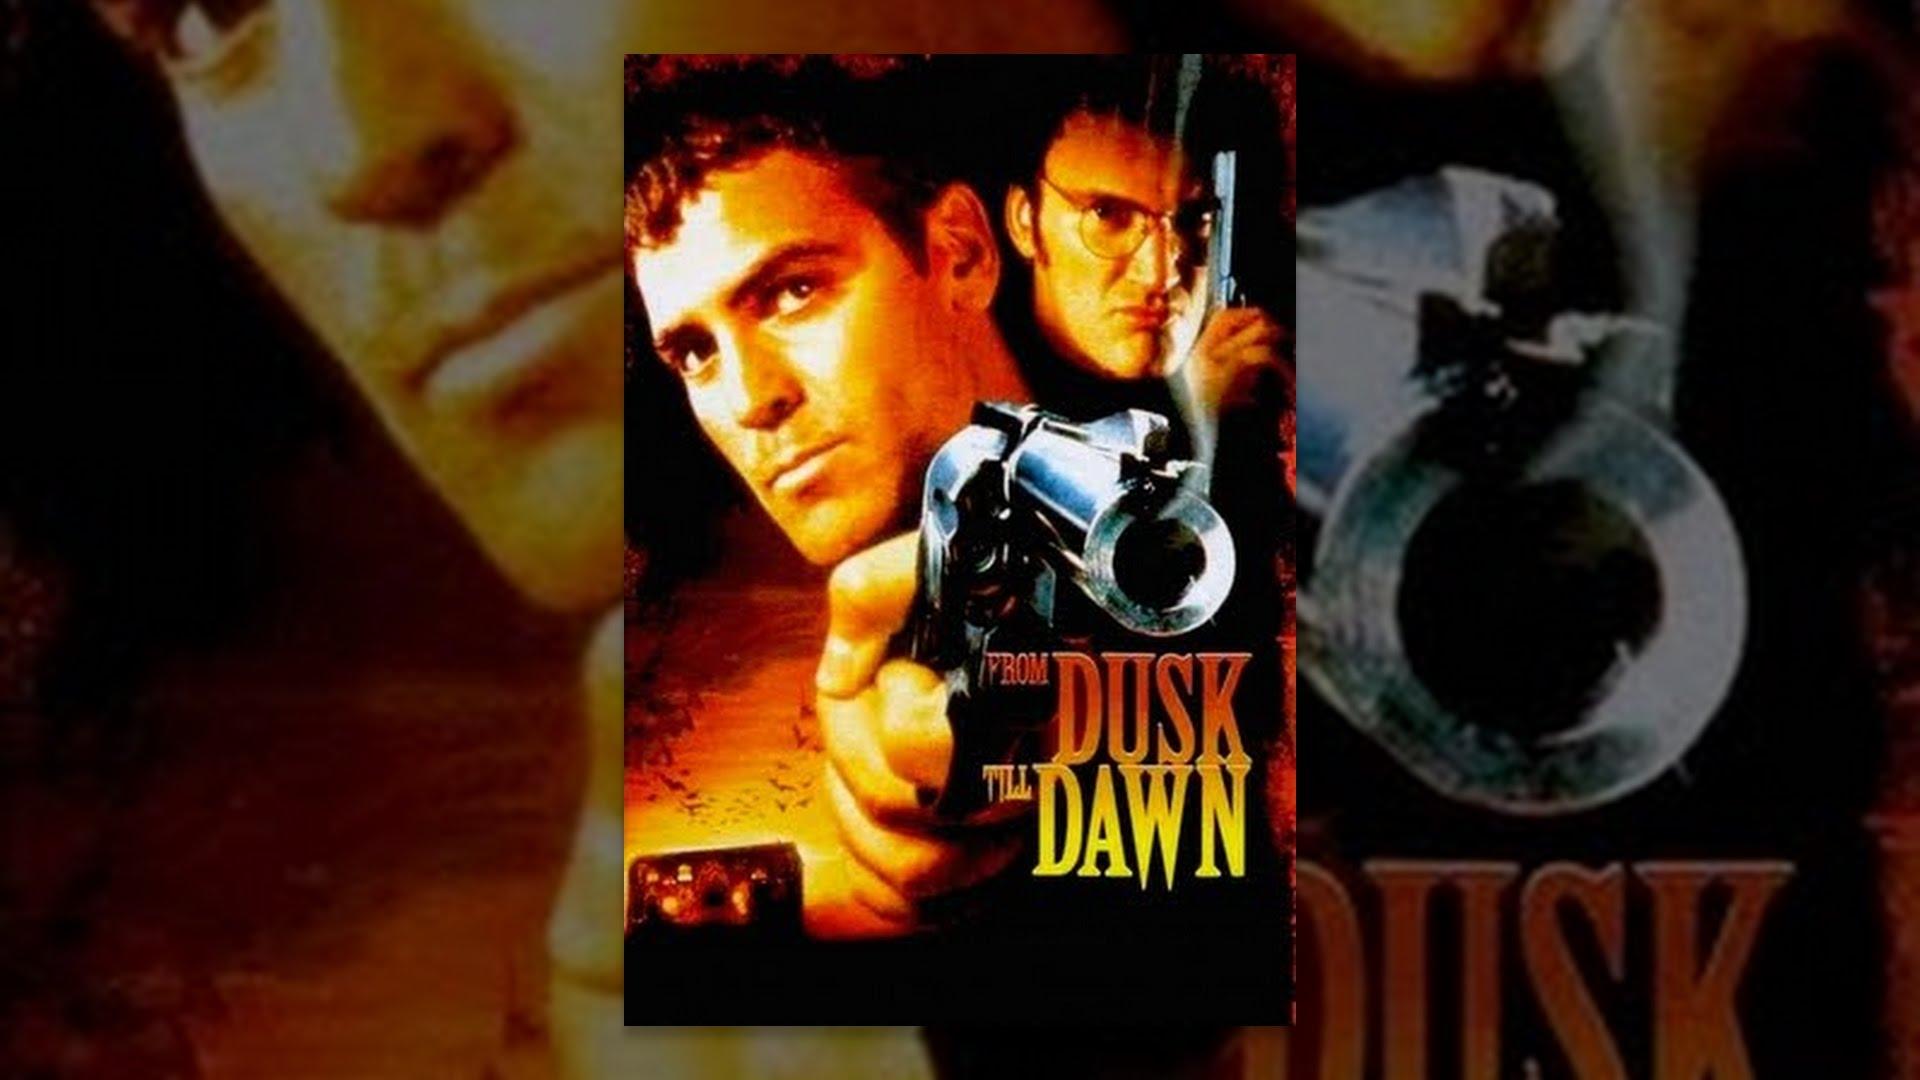 From Dusk Till Dawn Ganzer Film Deutsch